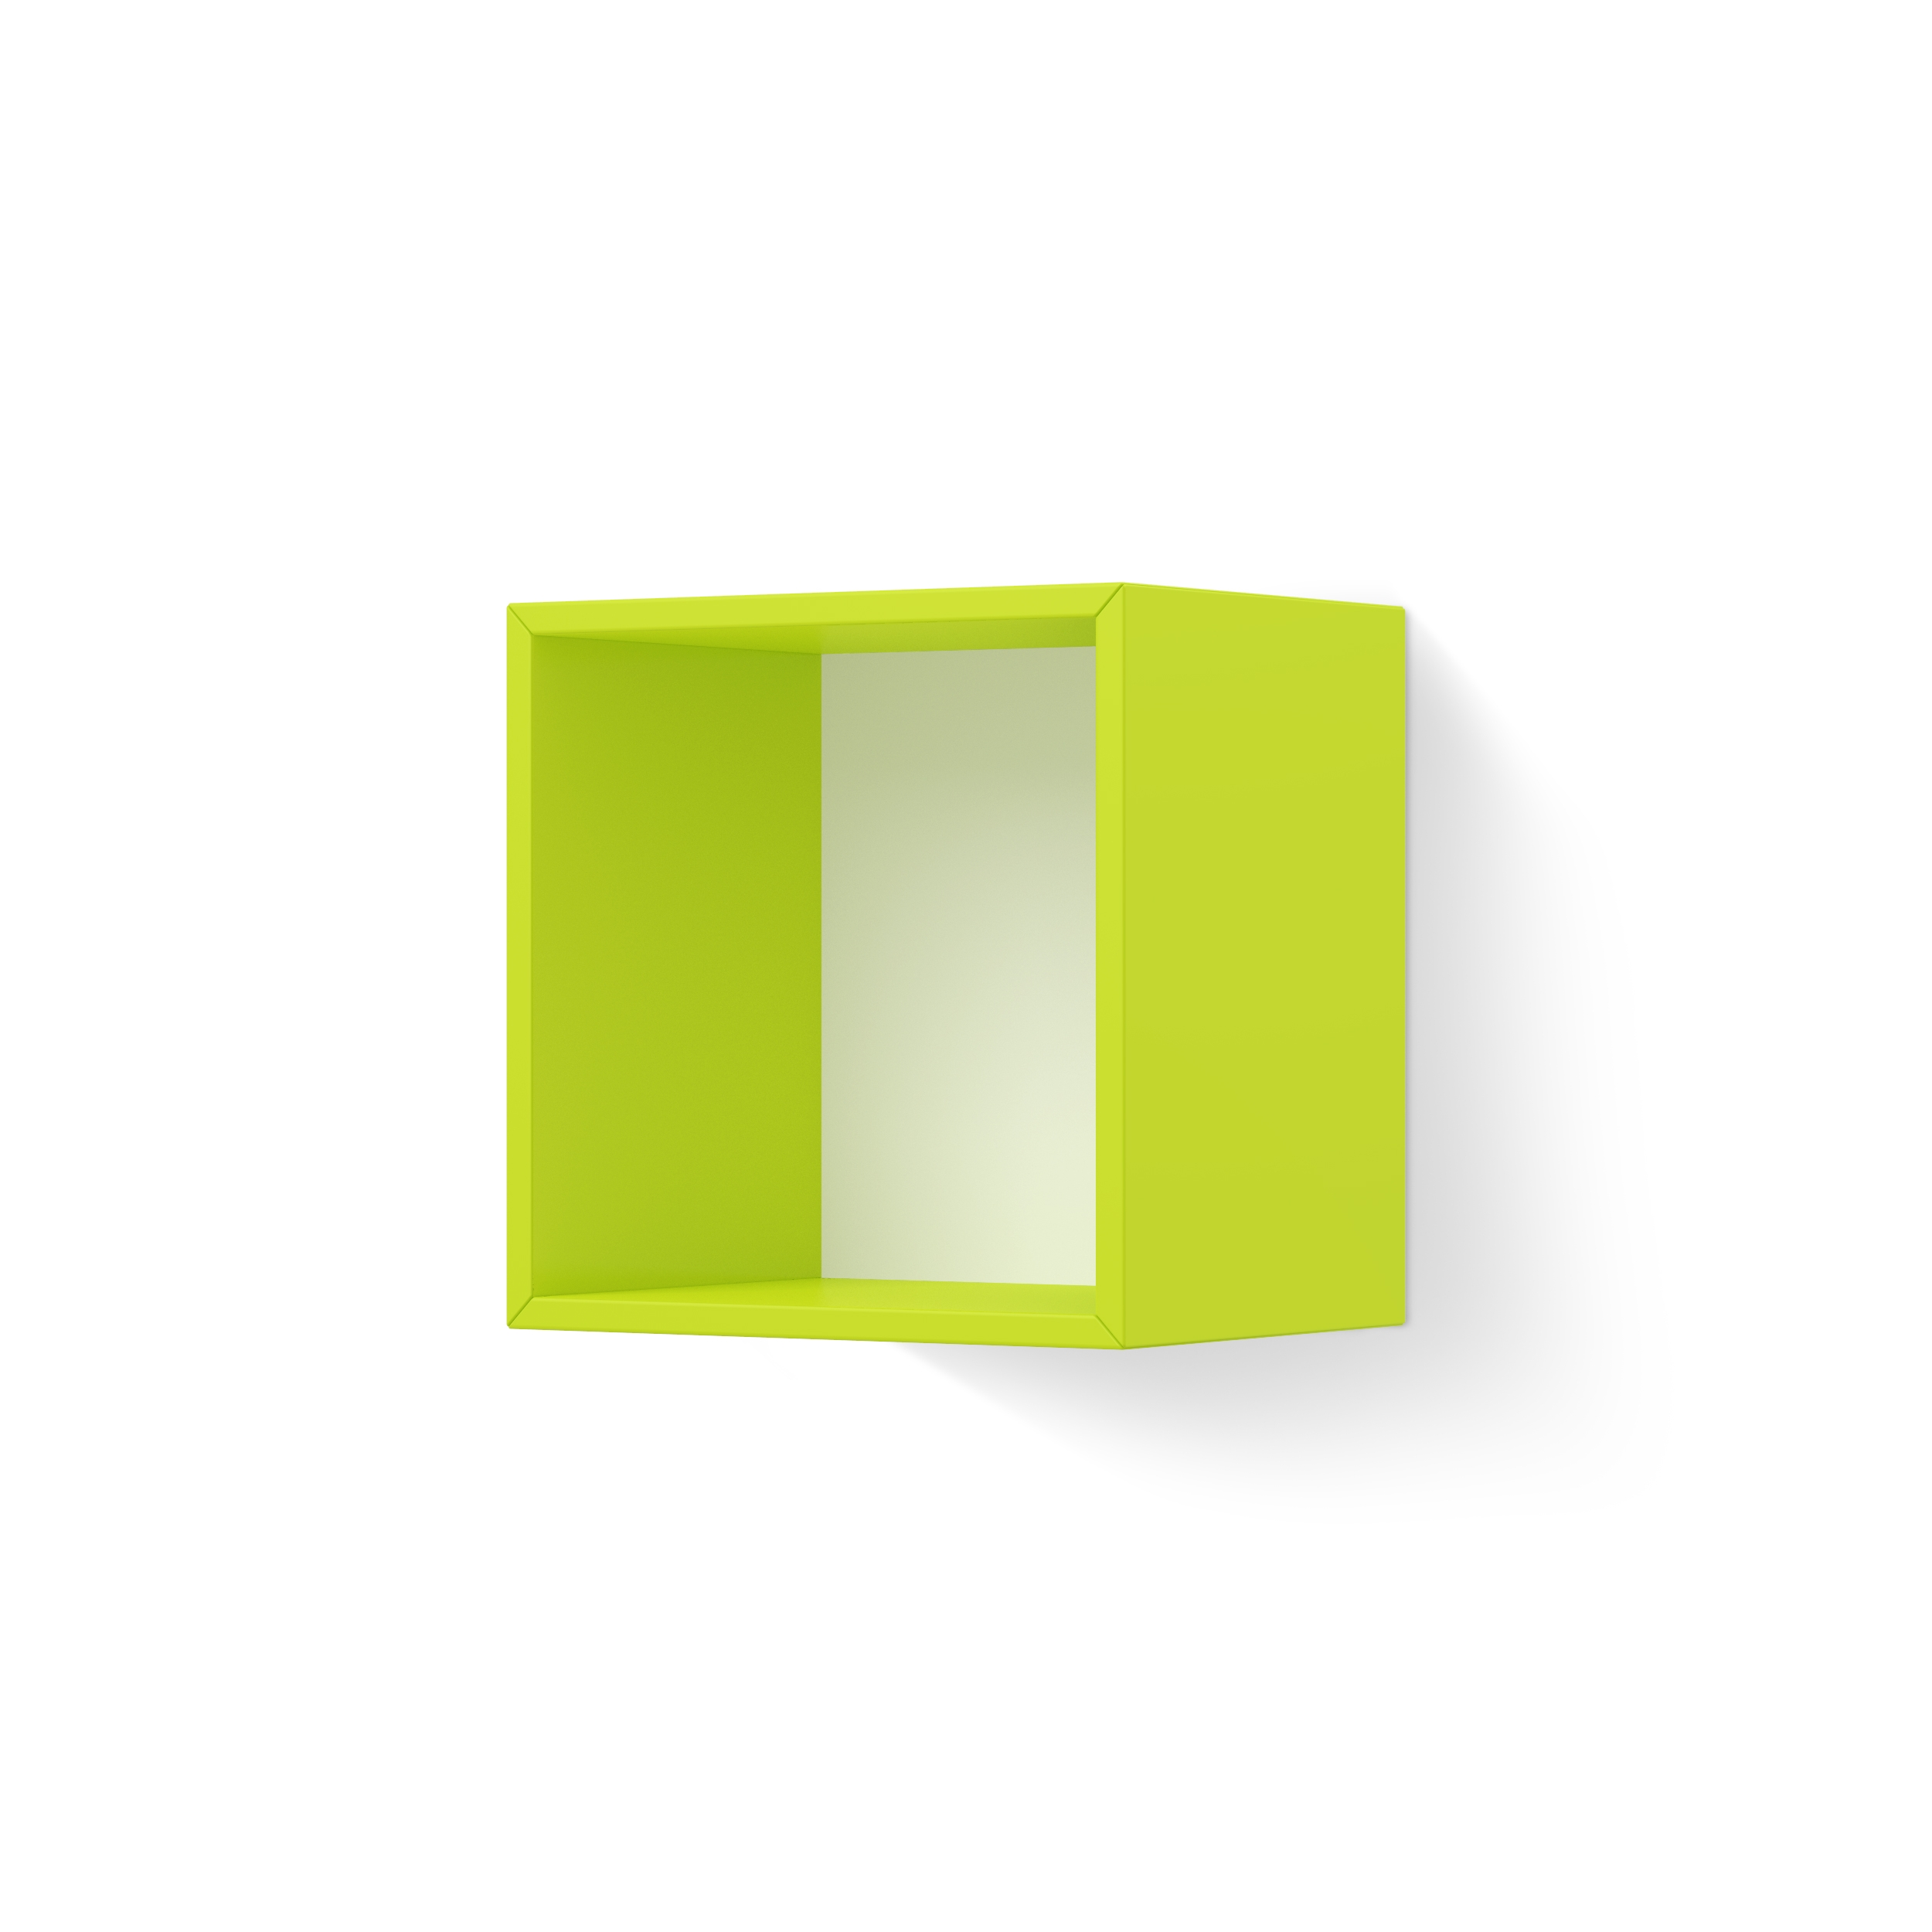 Raft Modular Mdf Verde Poza